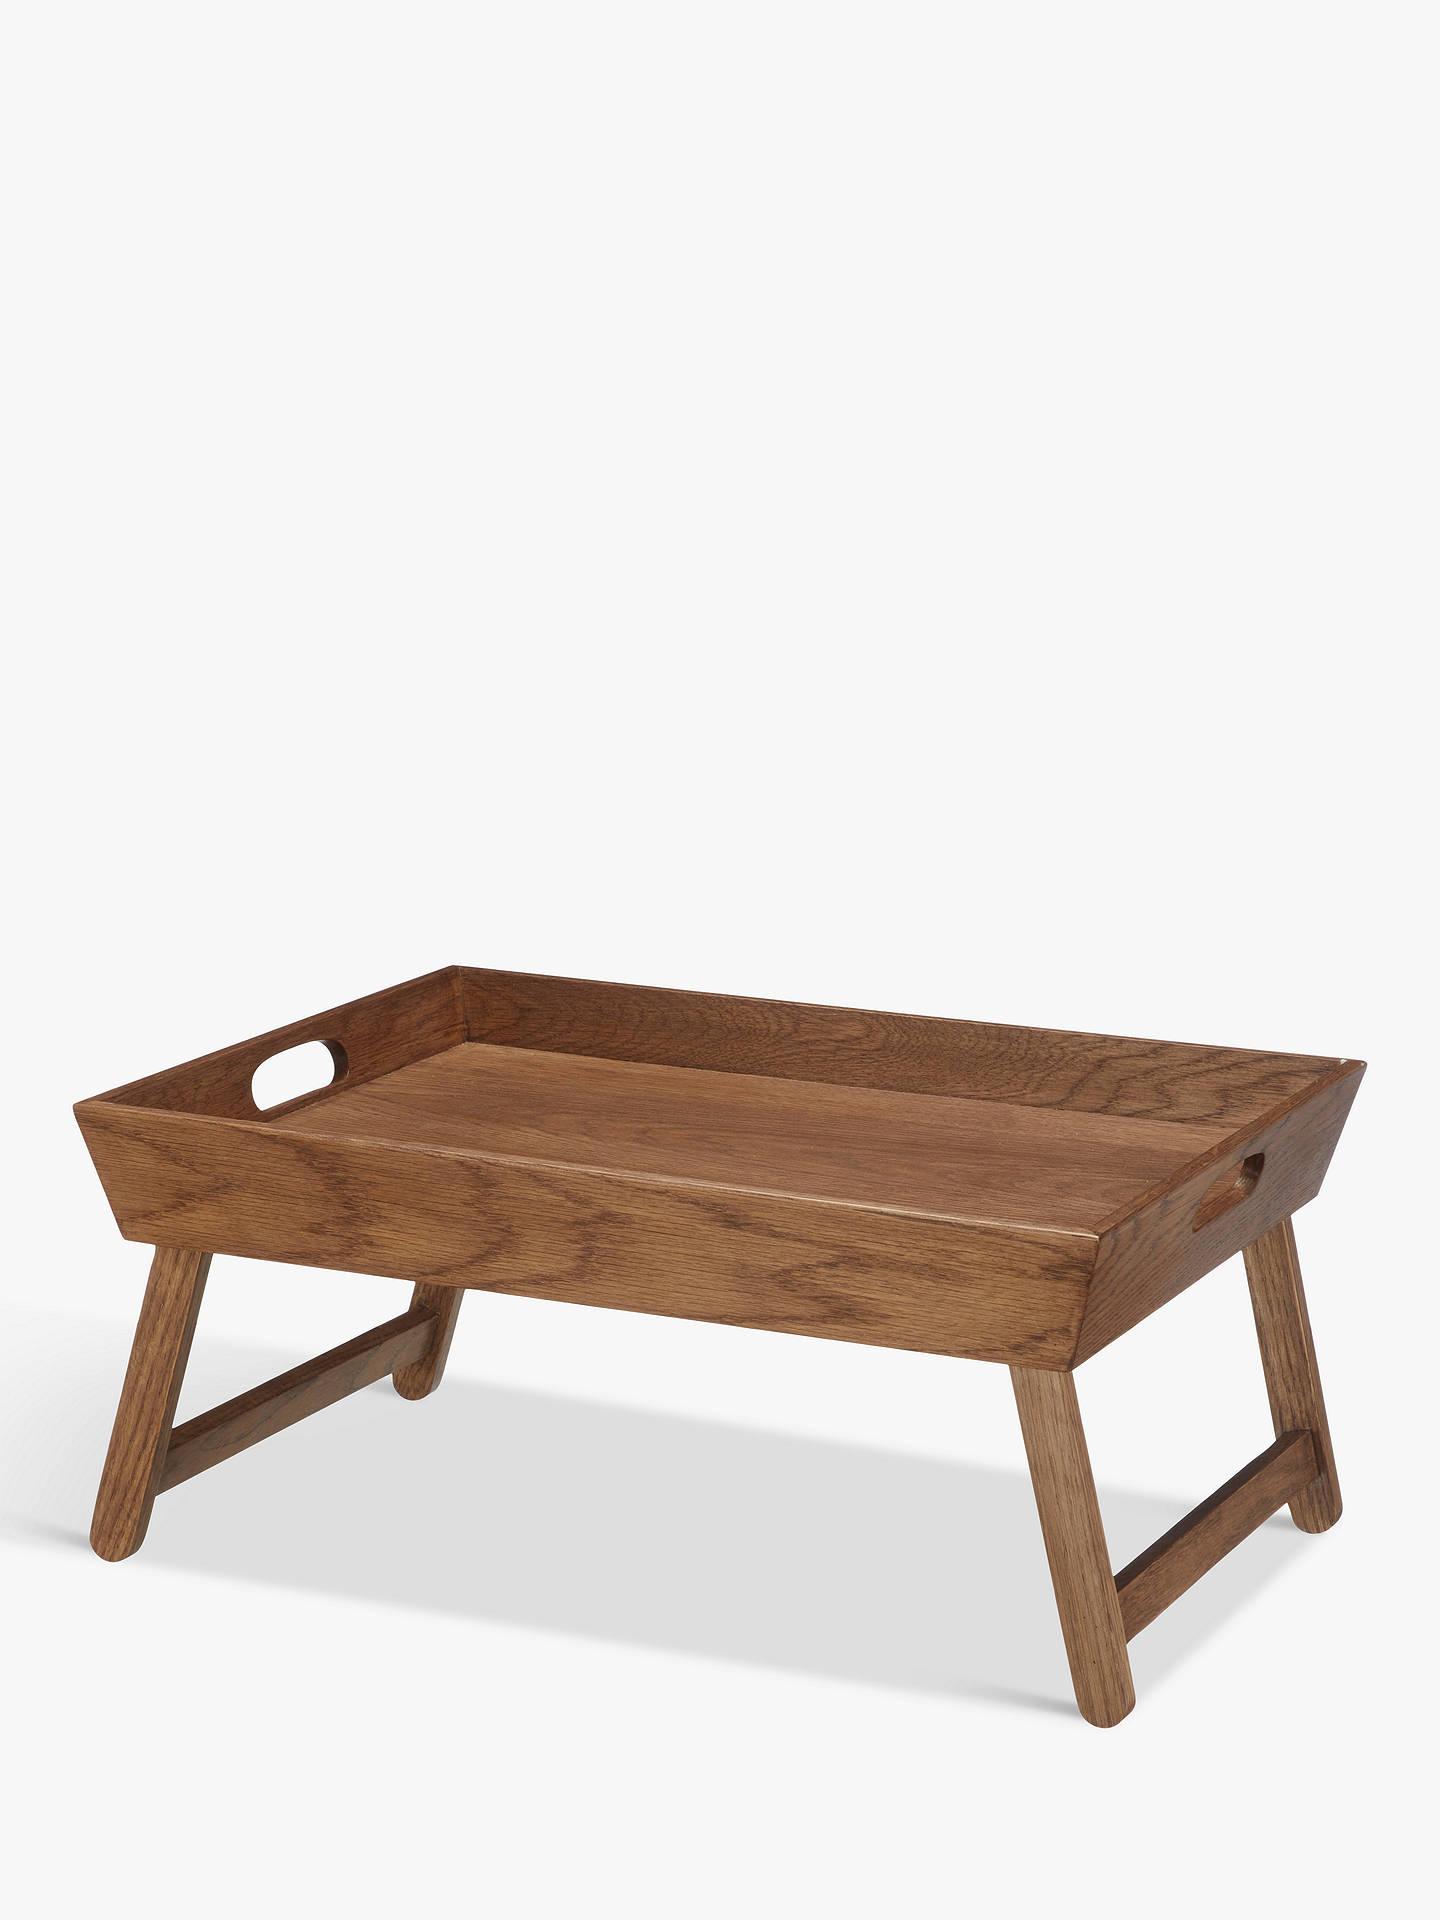 Croft Collection Folding Oak Wood Bedroom Tray Natural At